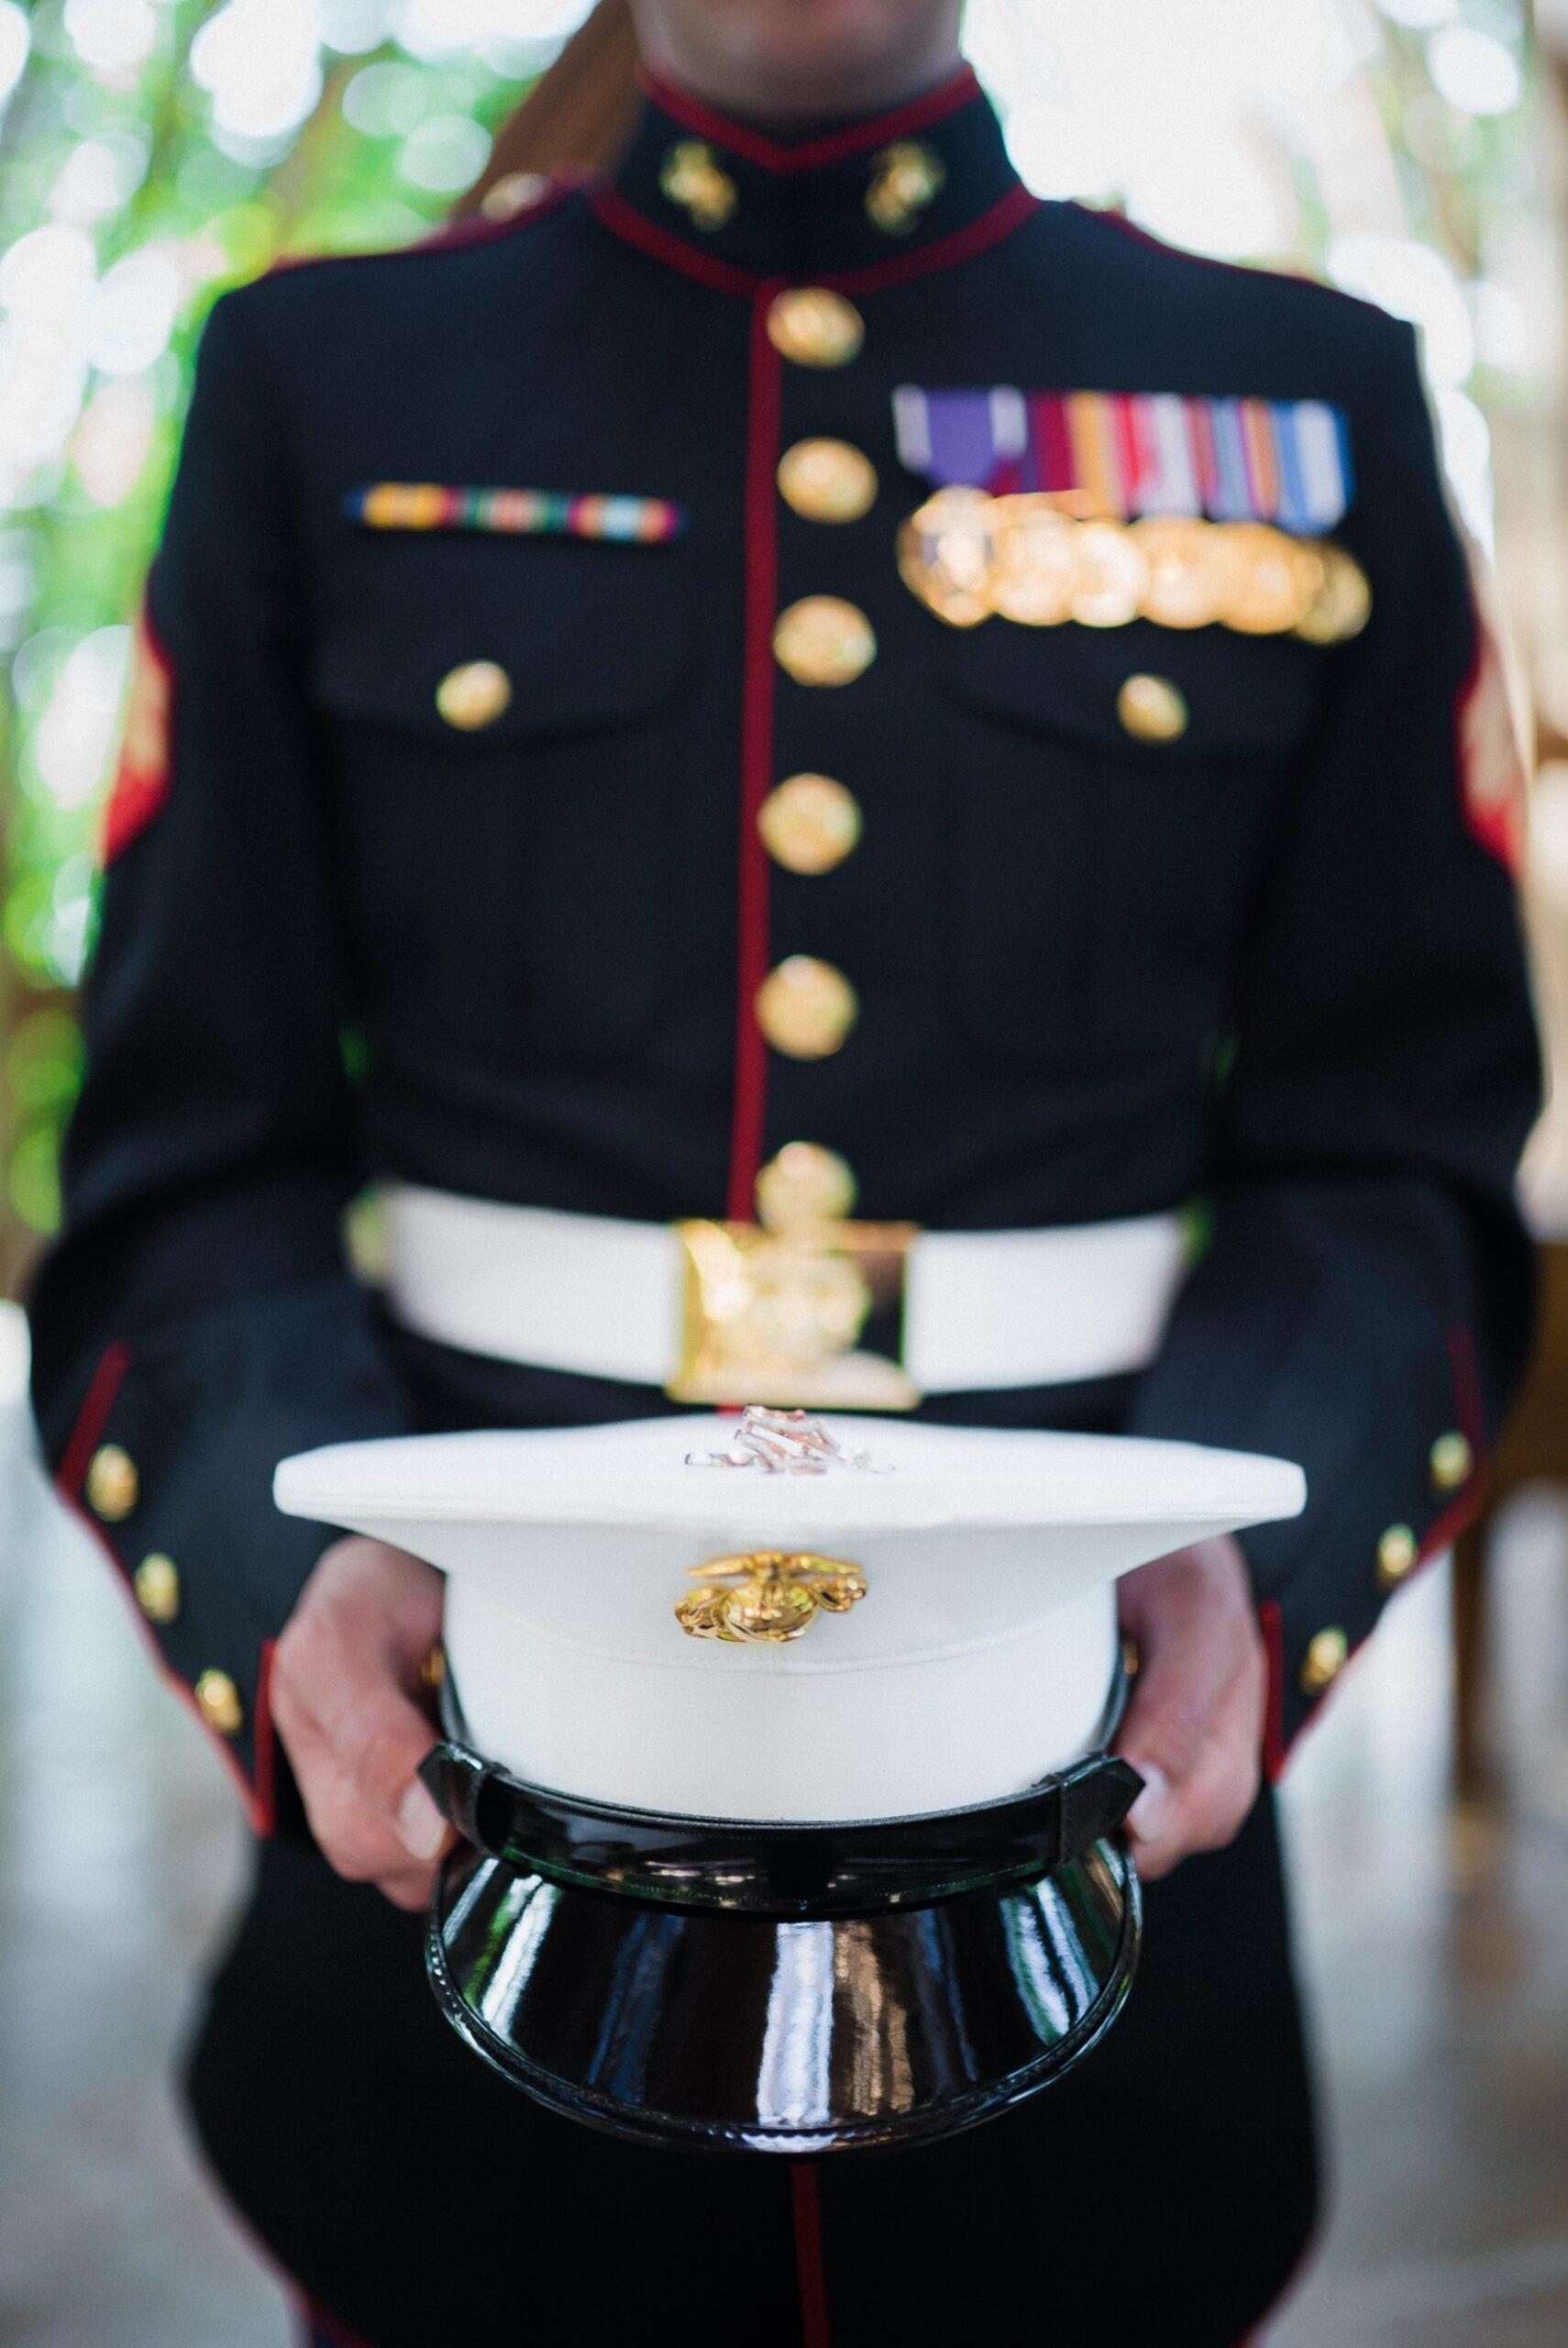 marines_karsten-winegeart-MwP-cougbcQ-unsplash